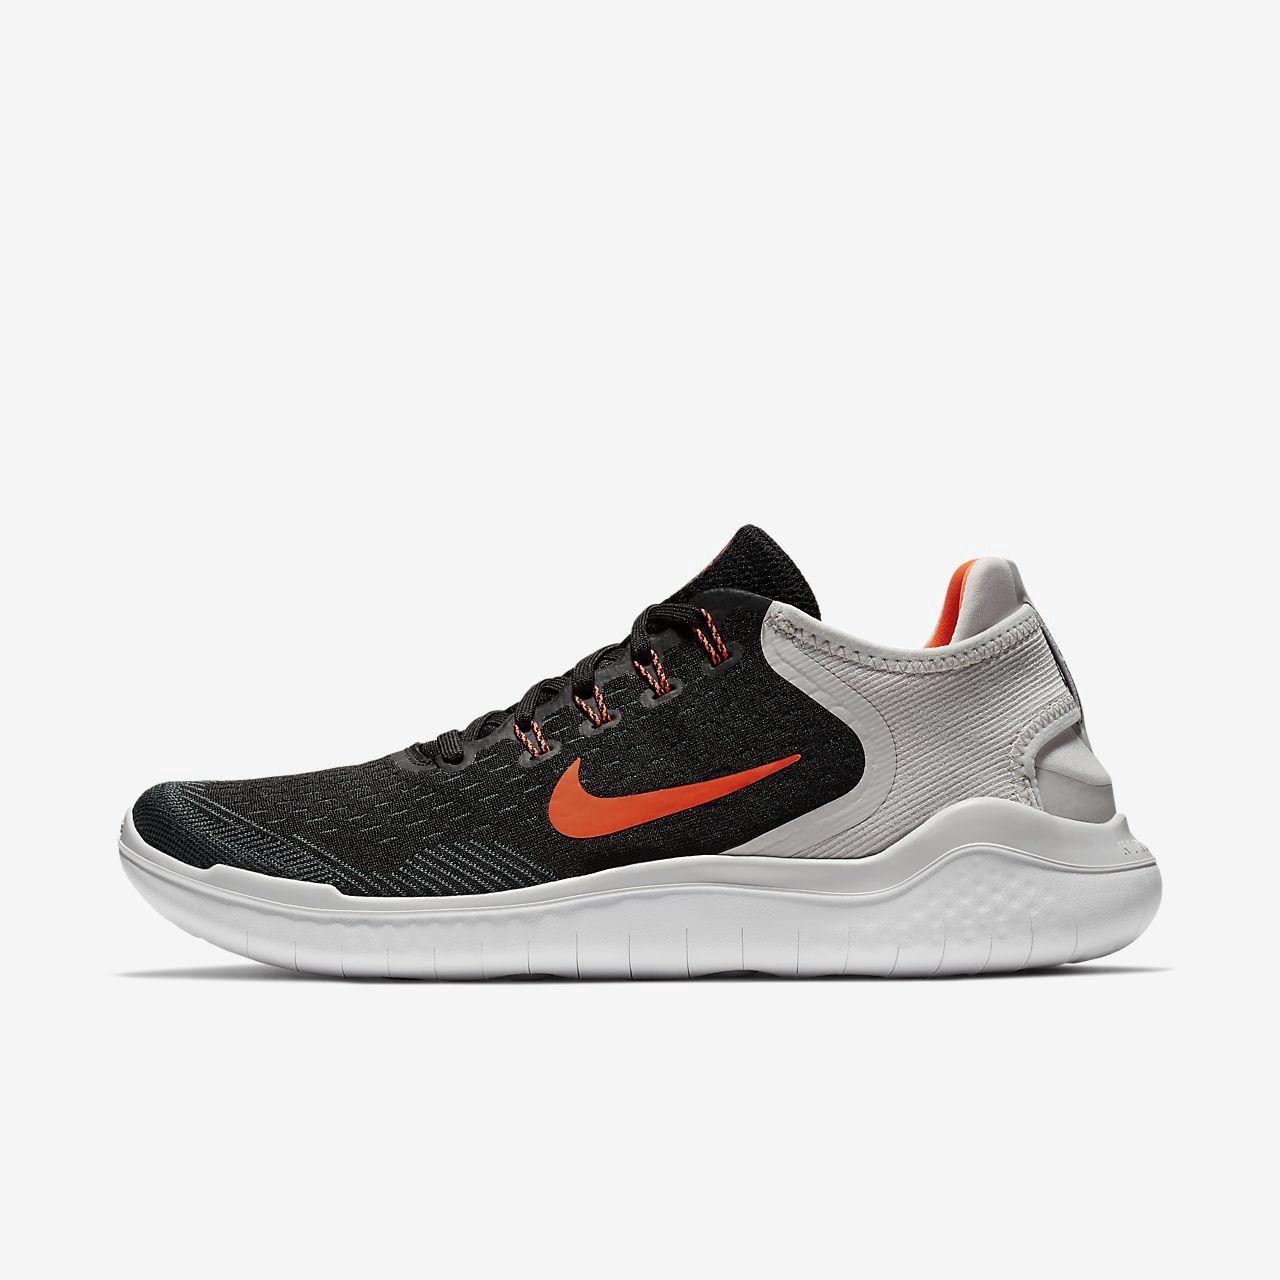 785d1653bb2 Nike Free Rn 2018 Men s Running Shoe - 9.5 Crimson